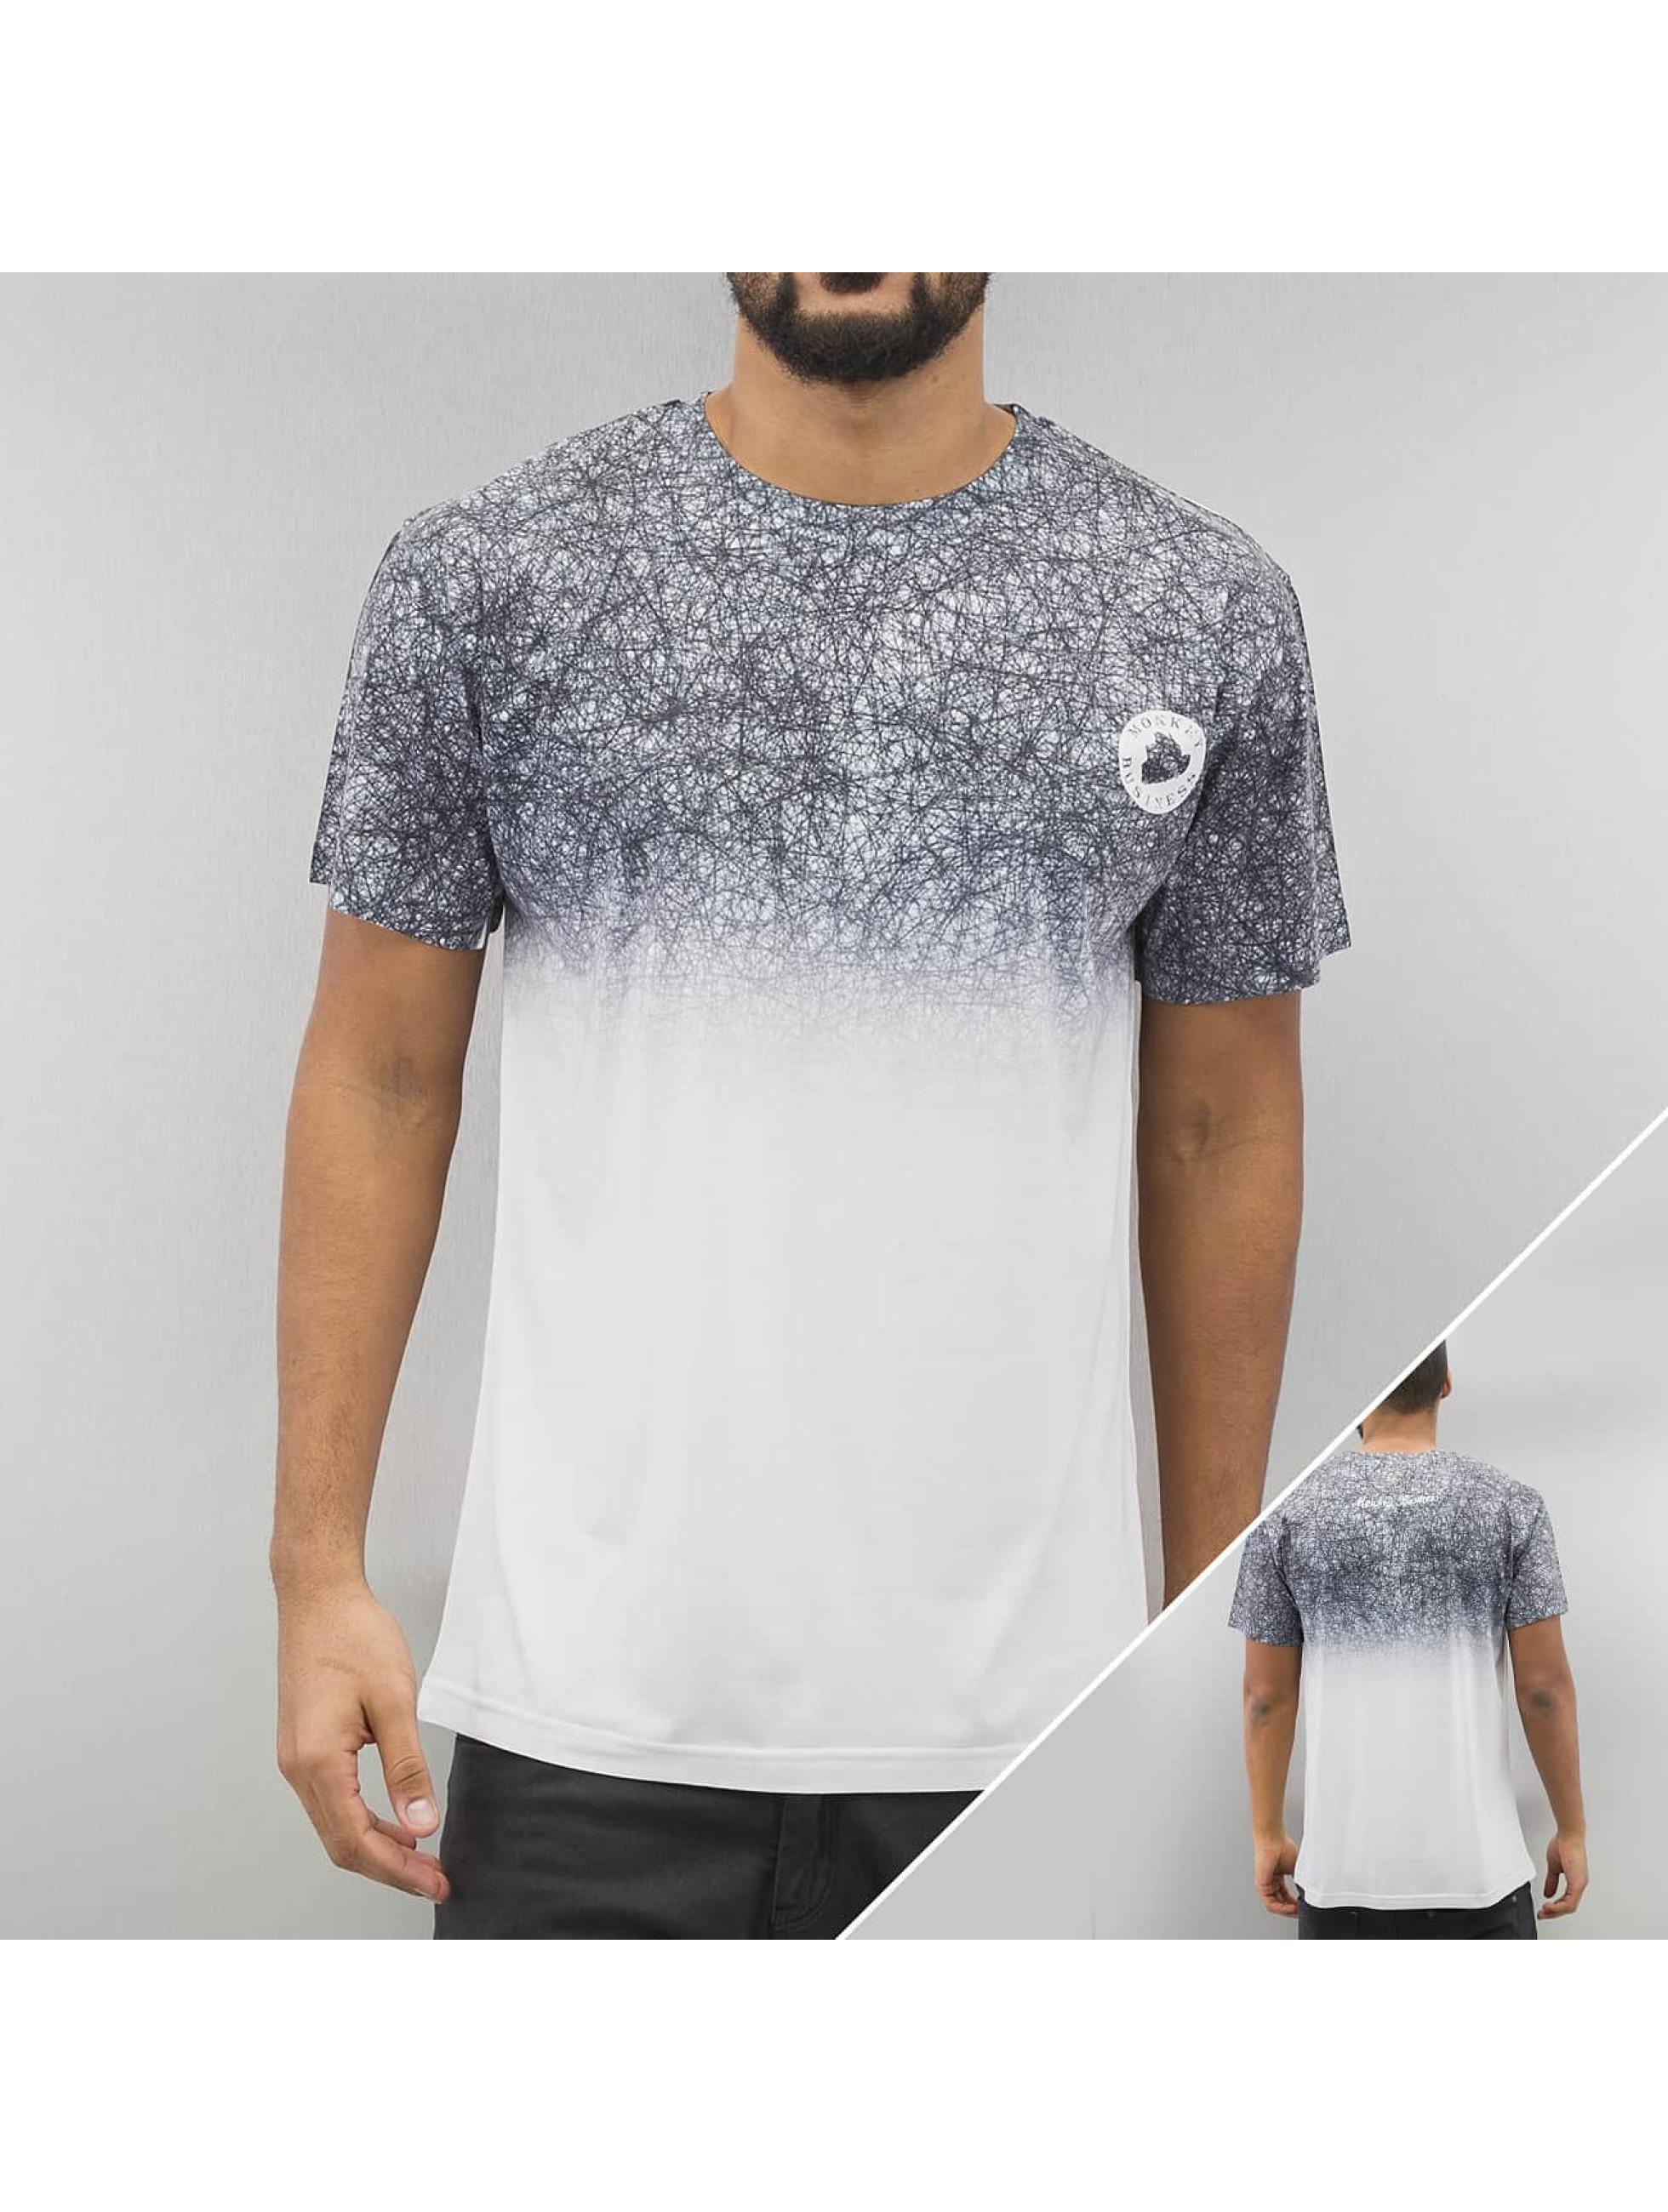 Monkey Business T-Shirt Black Scribble grey